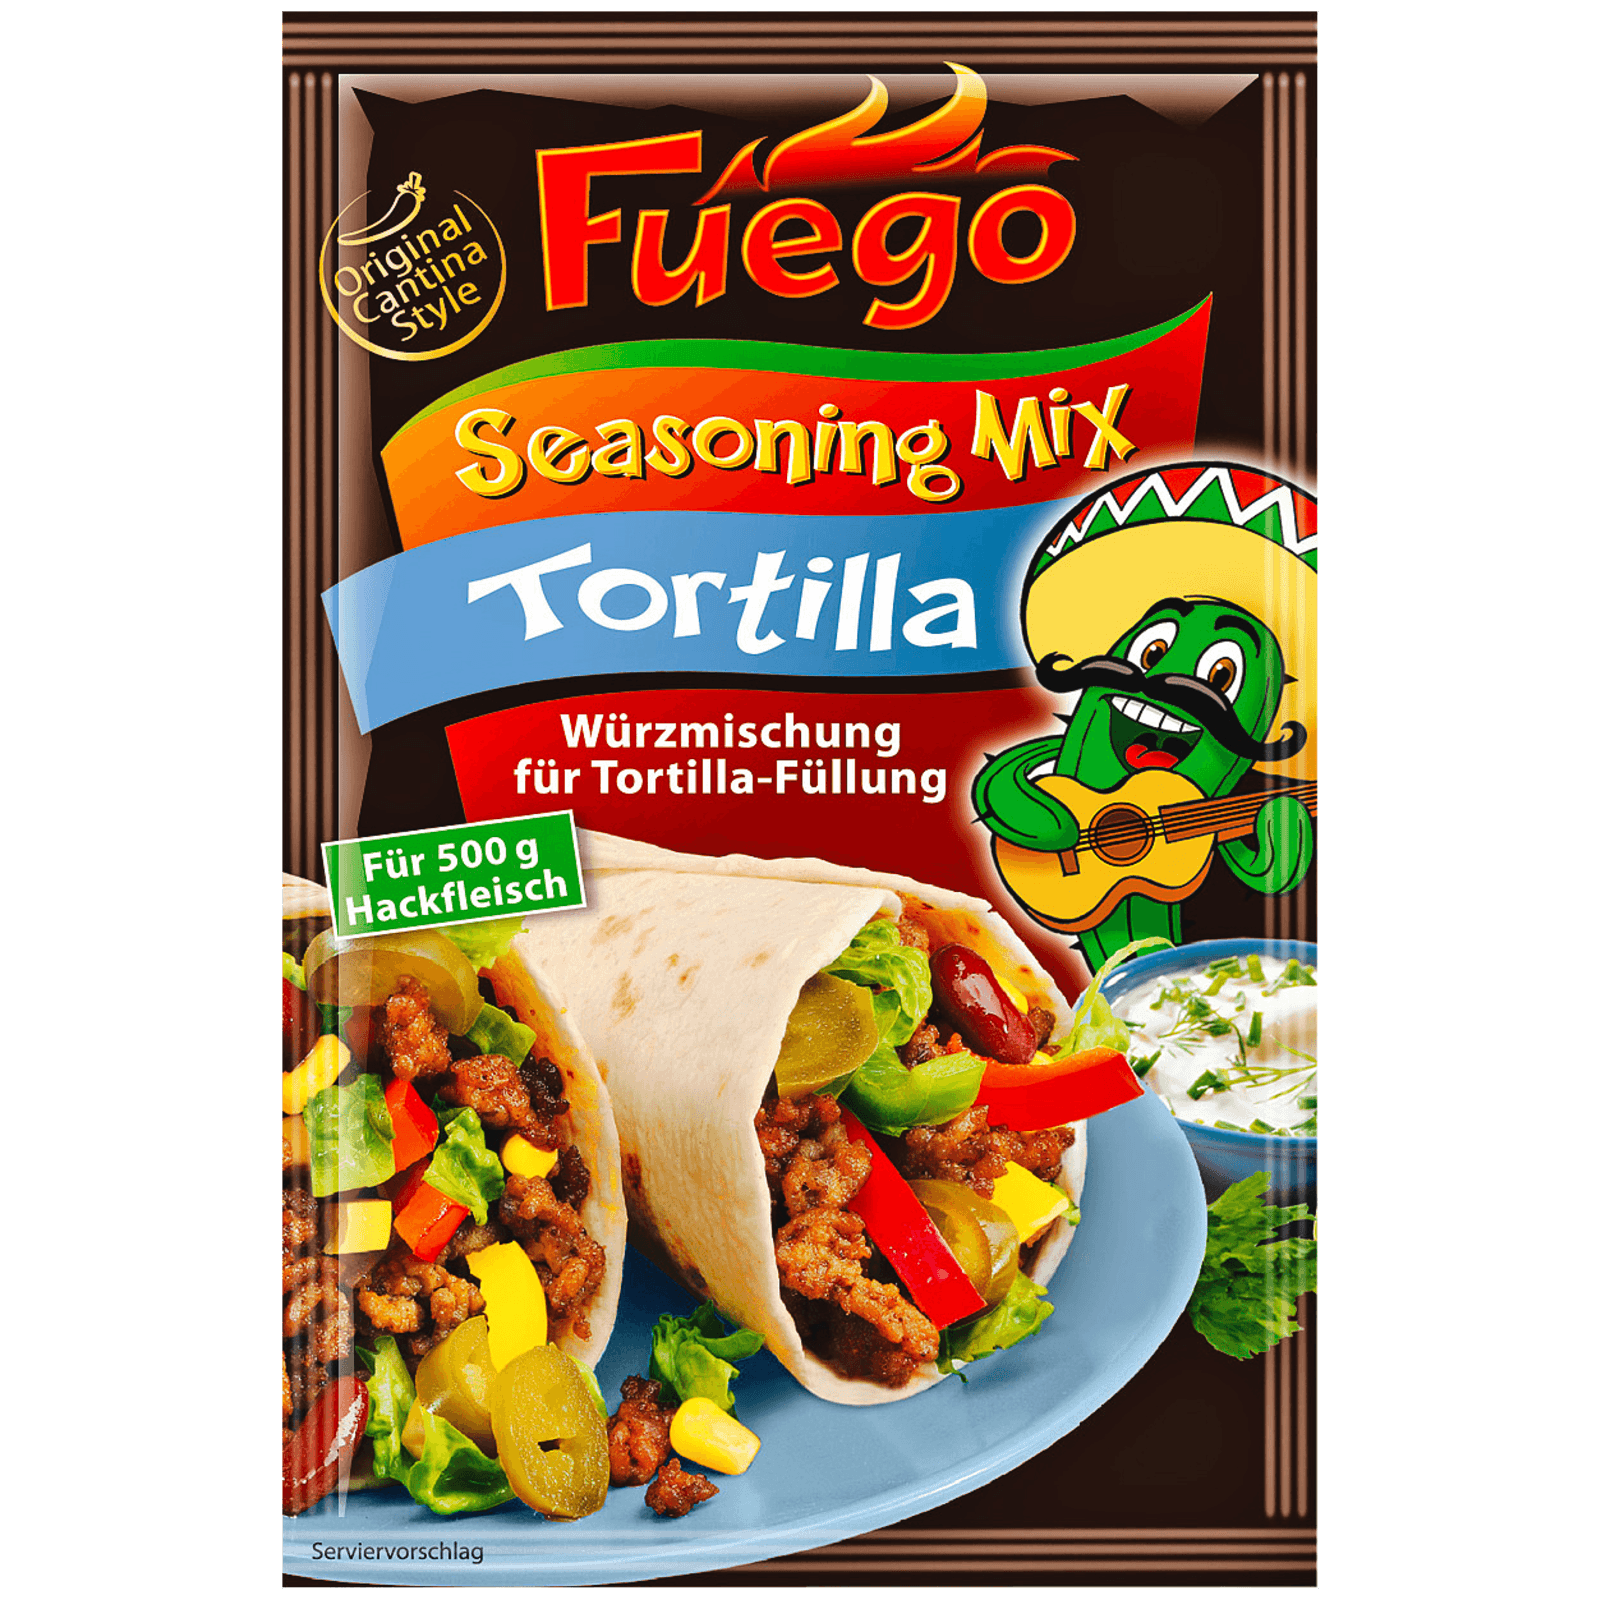 Fuego Tortilla Seasoning-Mix 35g